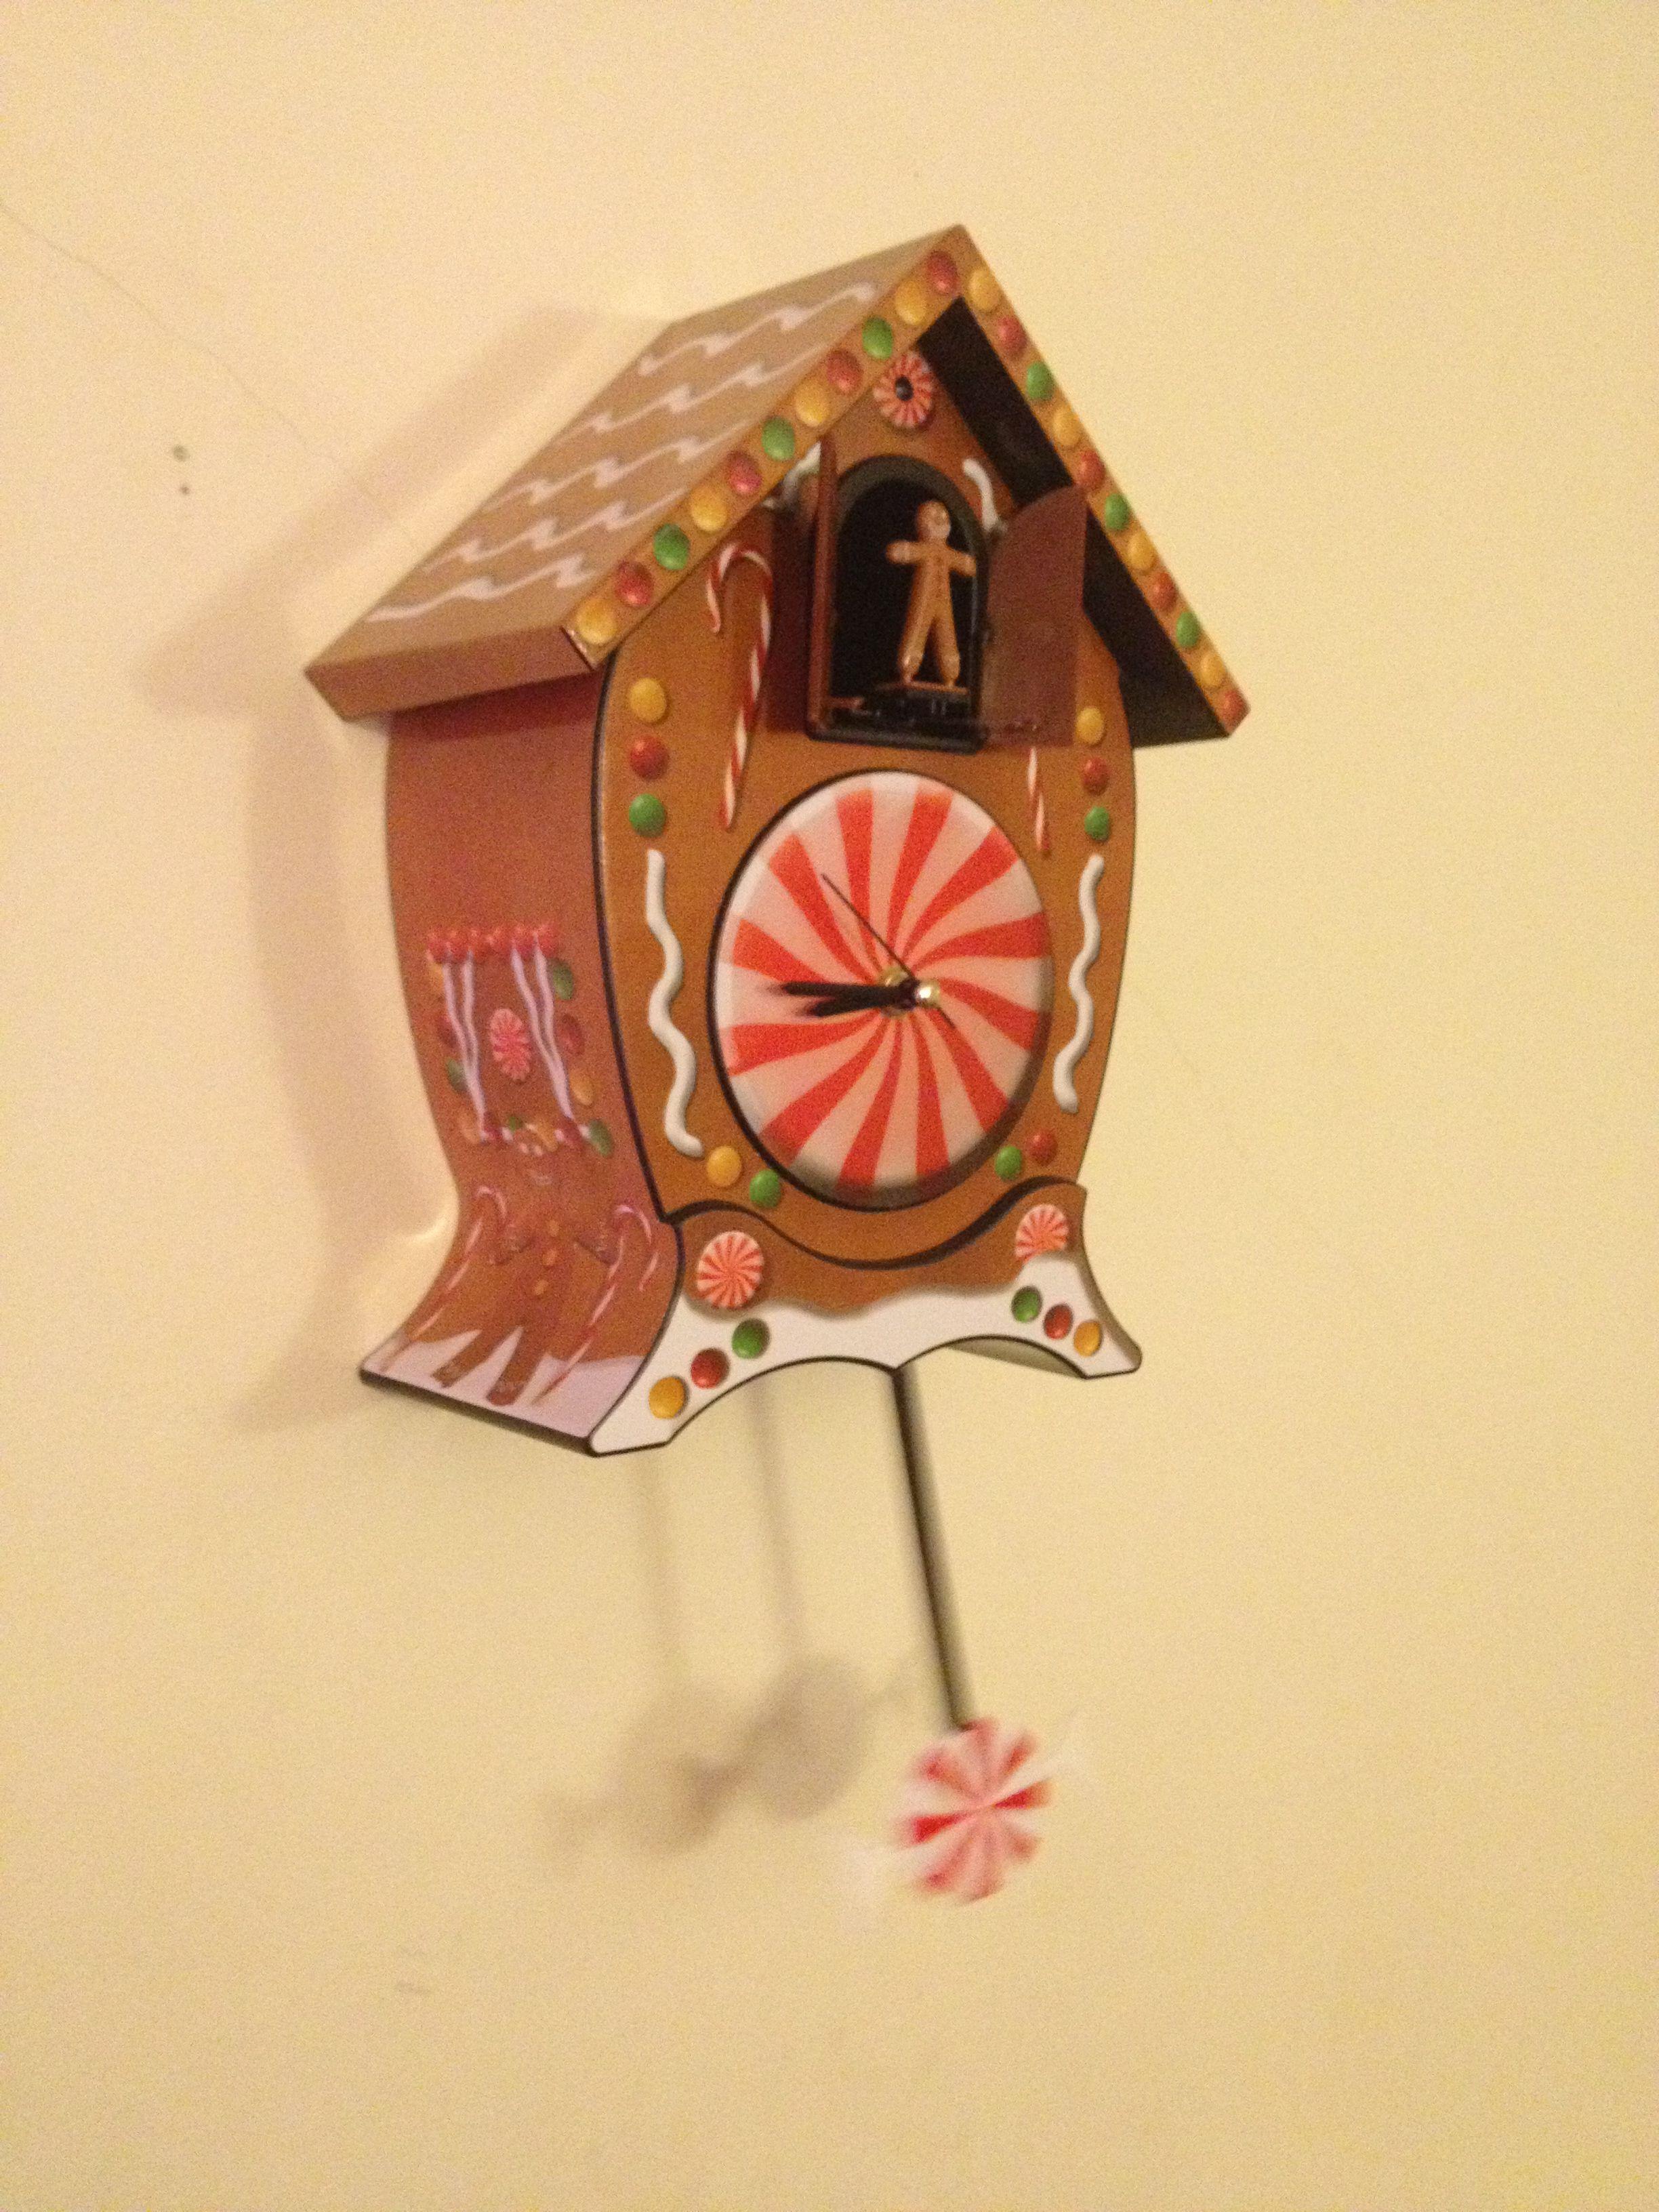 Gingerbread man cuckoo clock from CVS Christmas